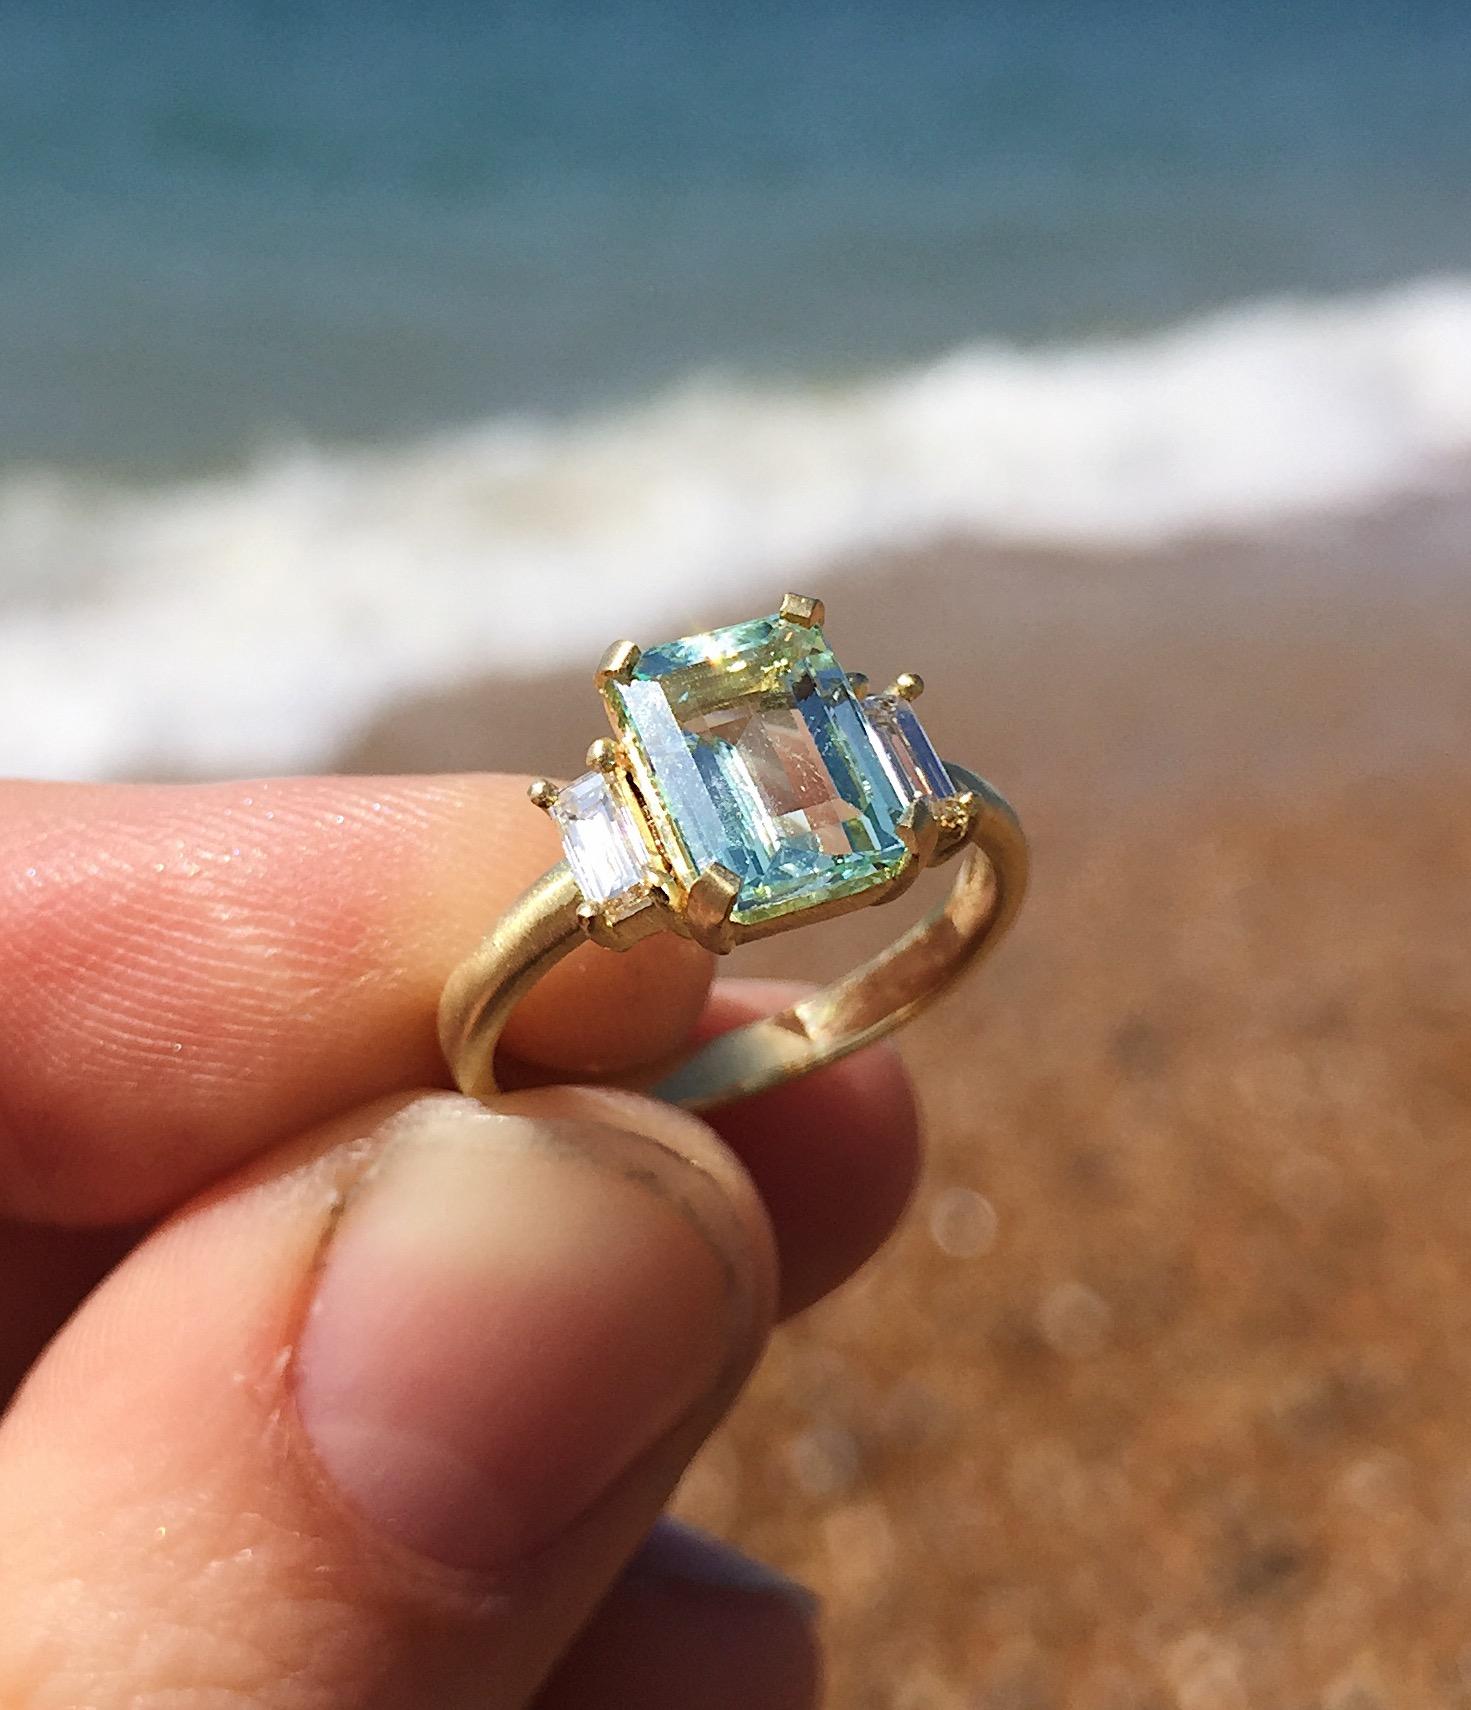 18ct Yellow Gold Emerald Cut Beryl And Diamond Deco Engagement Ring Baroque Bespoke Jewellery